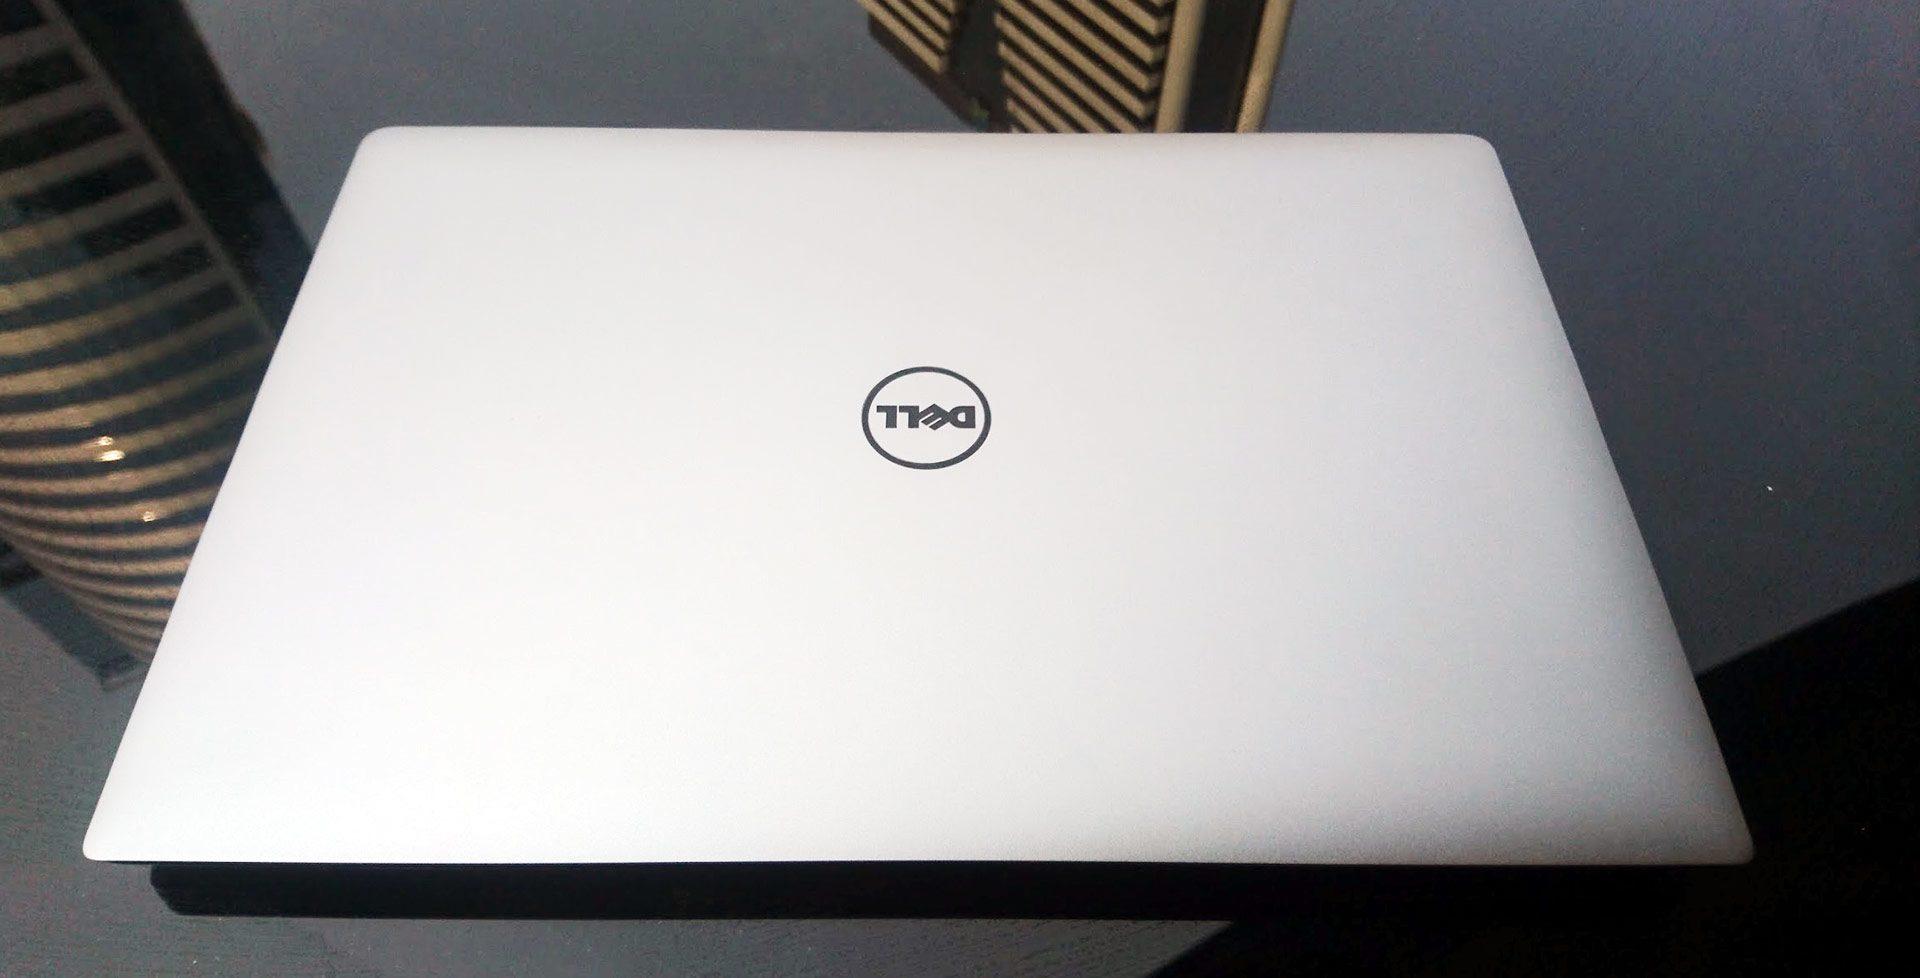 Dell XPS 15 9560 review - Core i7 CPU, Nivida 1050 graphics and UHD